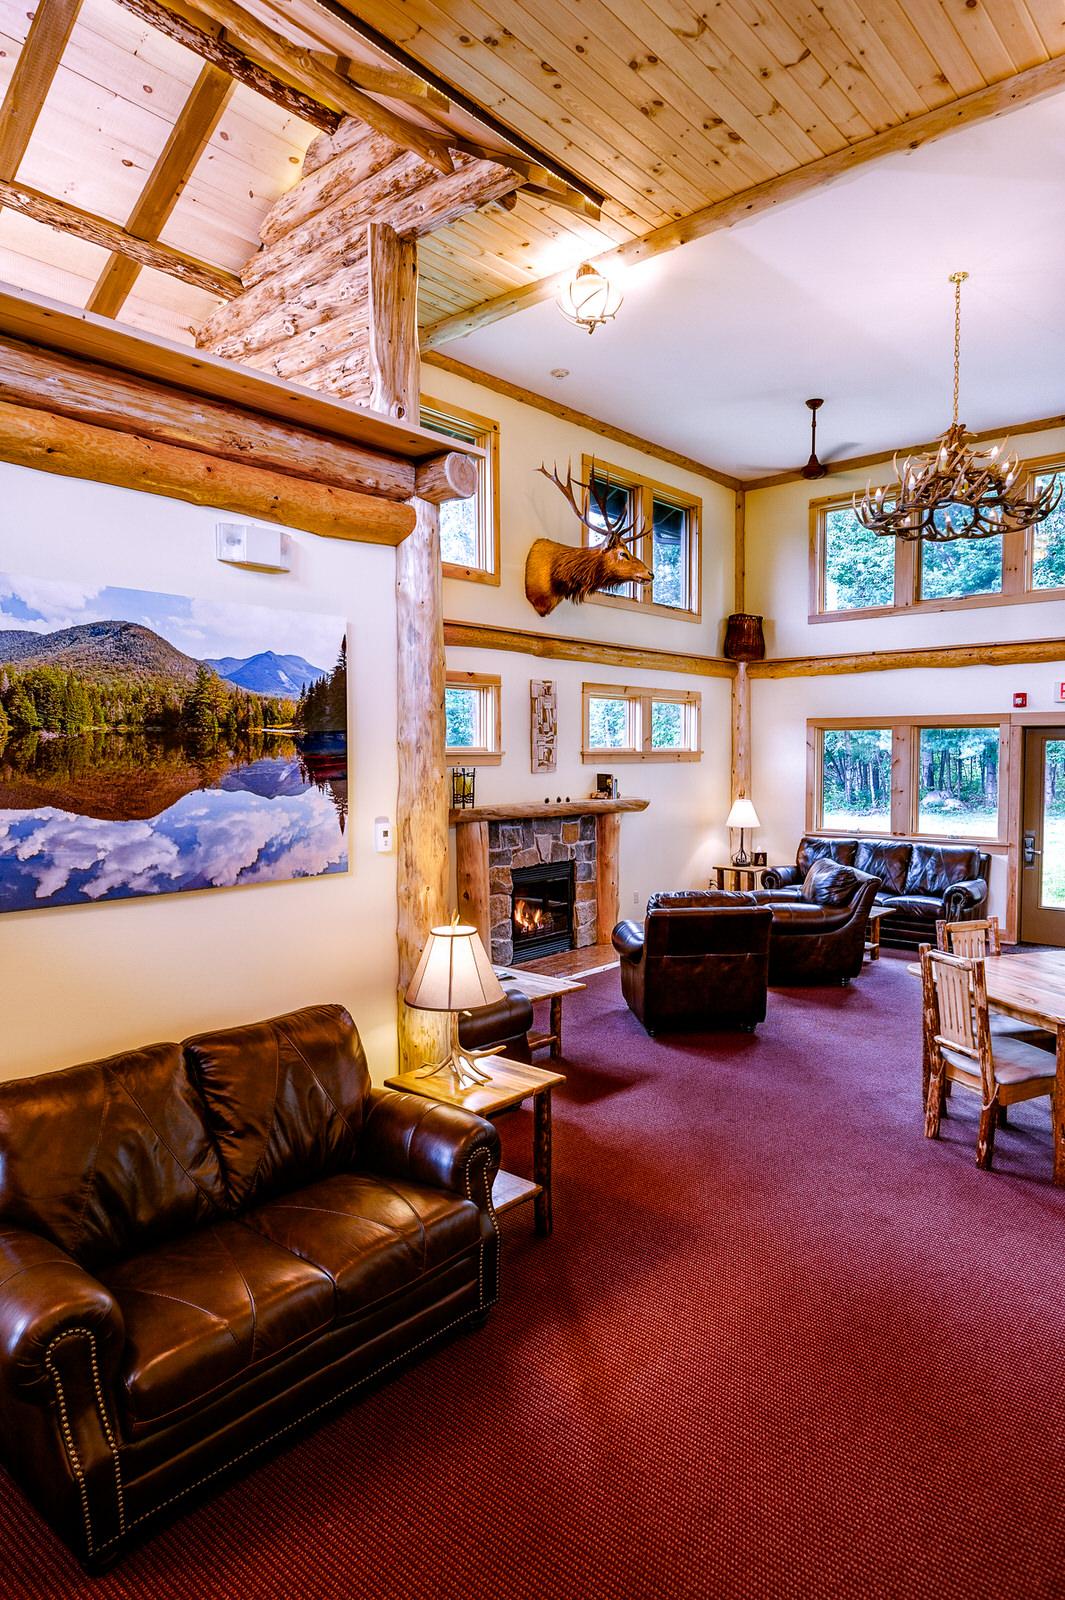 Adk-Spruce-Lodge-2048px-47.jpg